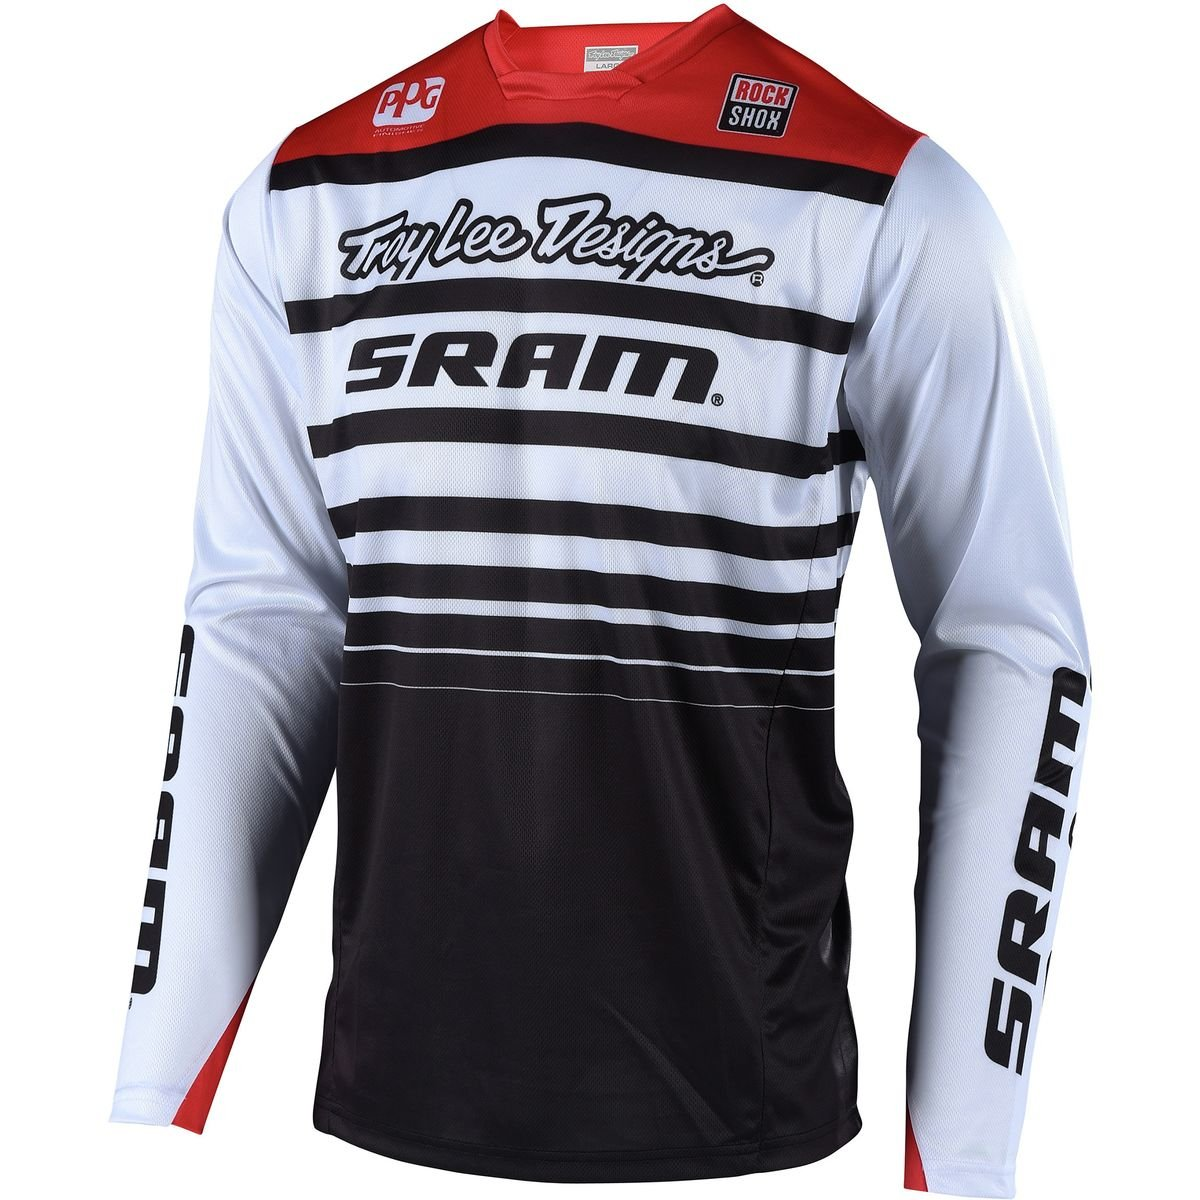 Troy Lee Designs Sprint Long-Sleeve Jersey - Men's Sram White/Black, XL